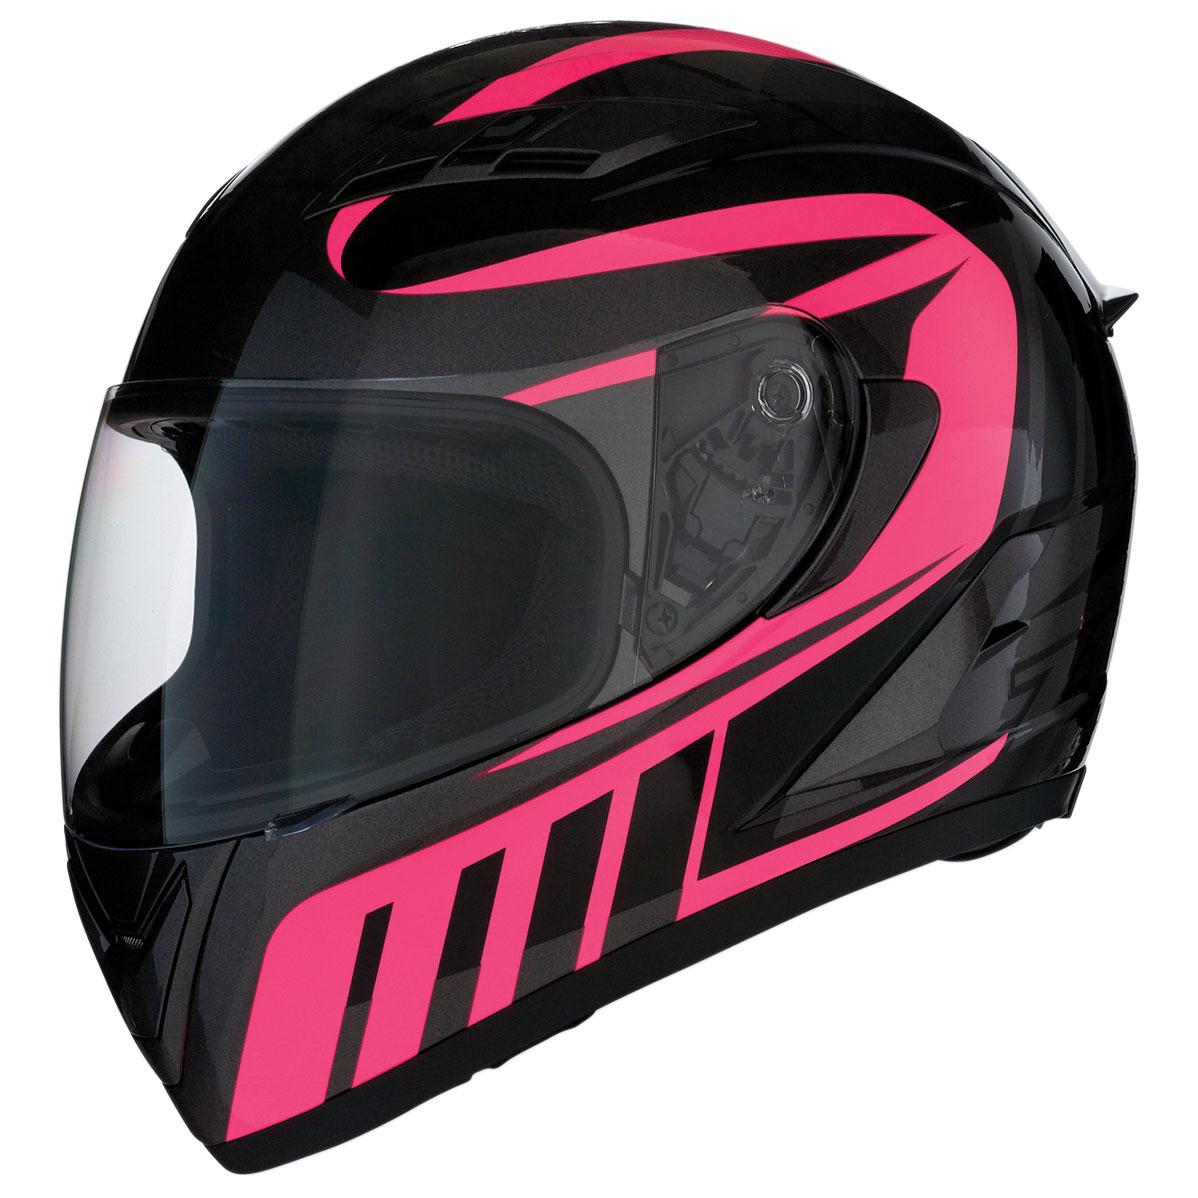 Z1R Strike Ops Attack Pink Full Face Helmet